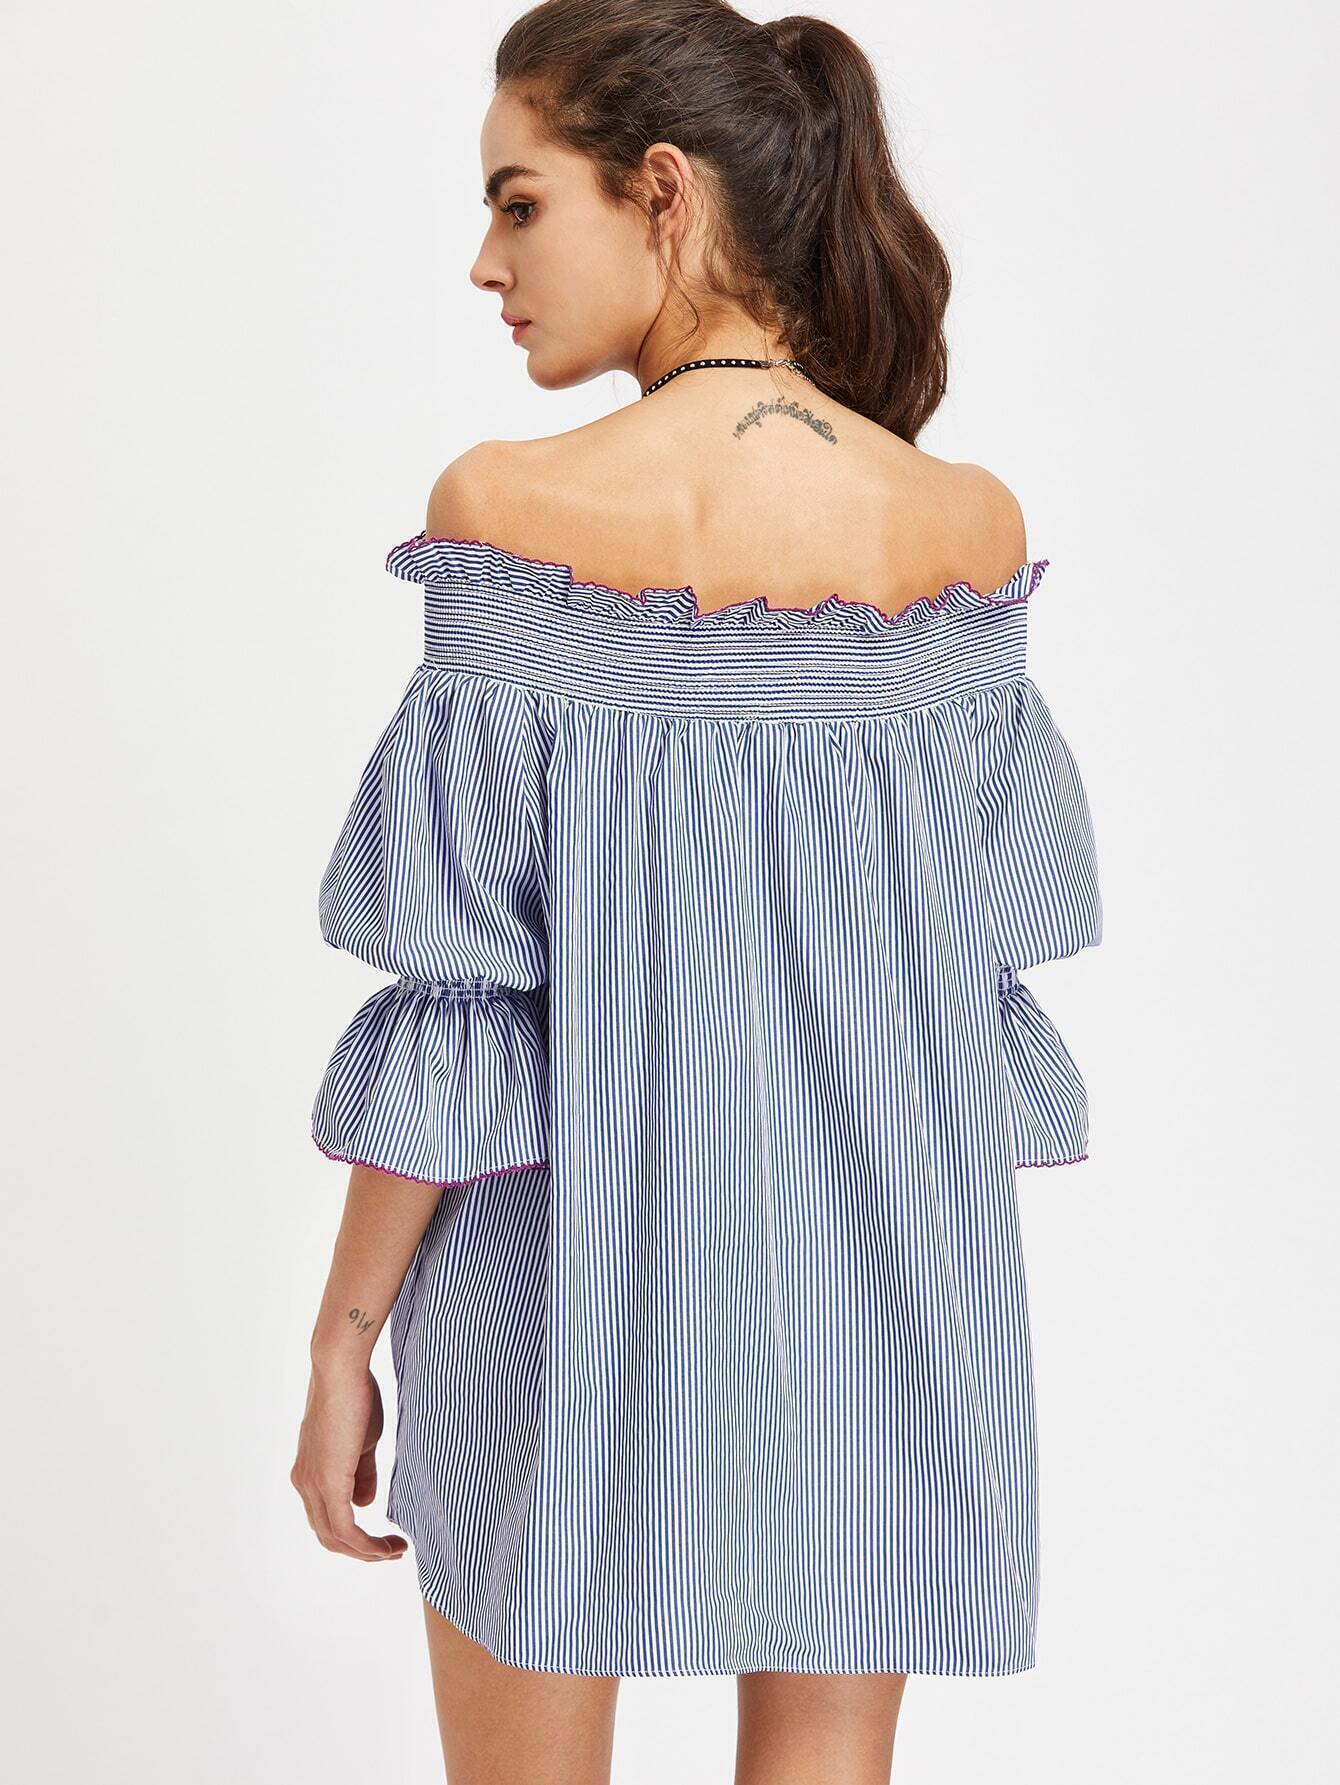 blouse170503108_2